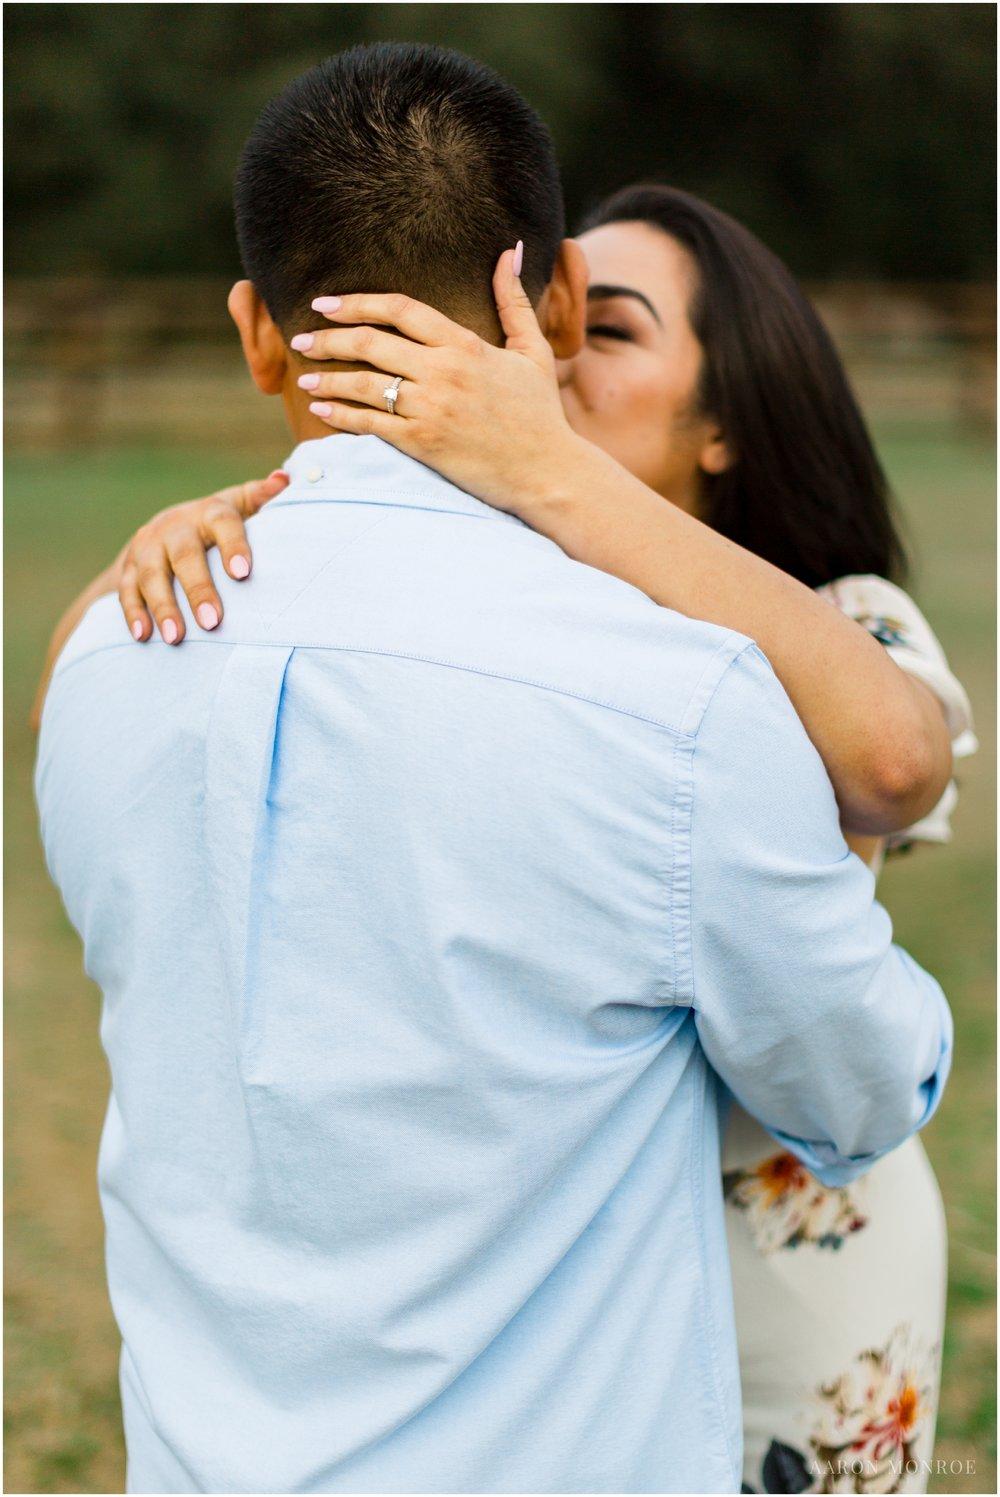 Mission_San_Juan_Capistrano_Engagement_Los_Angeles_Wedding_Photographer_0366.jpg